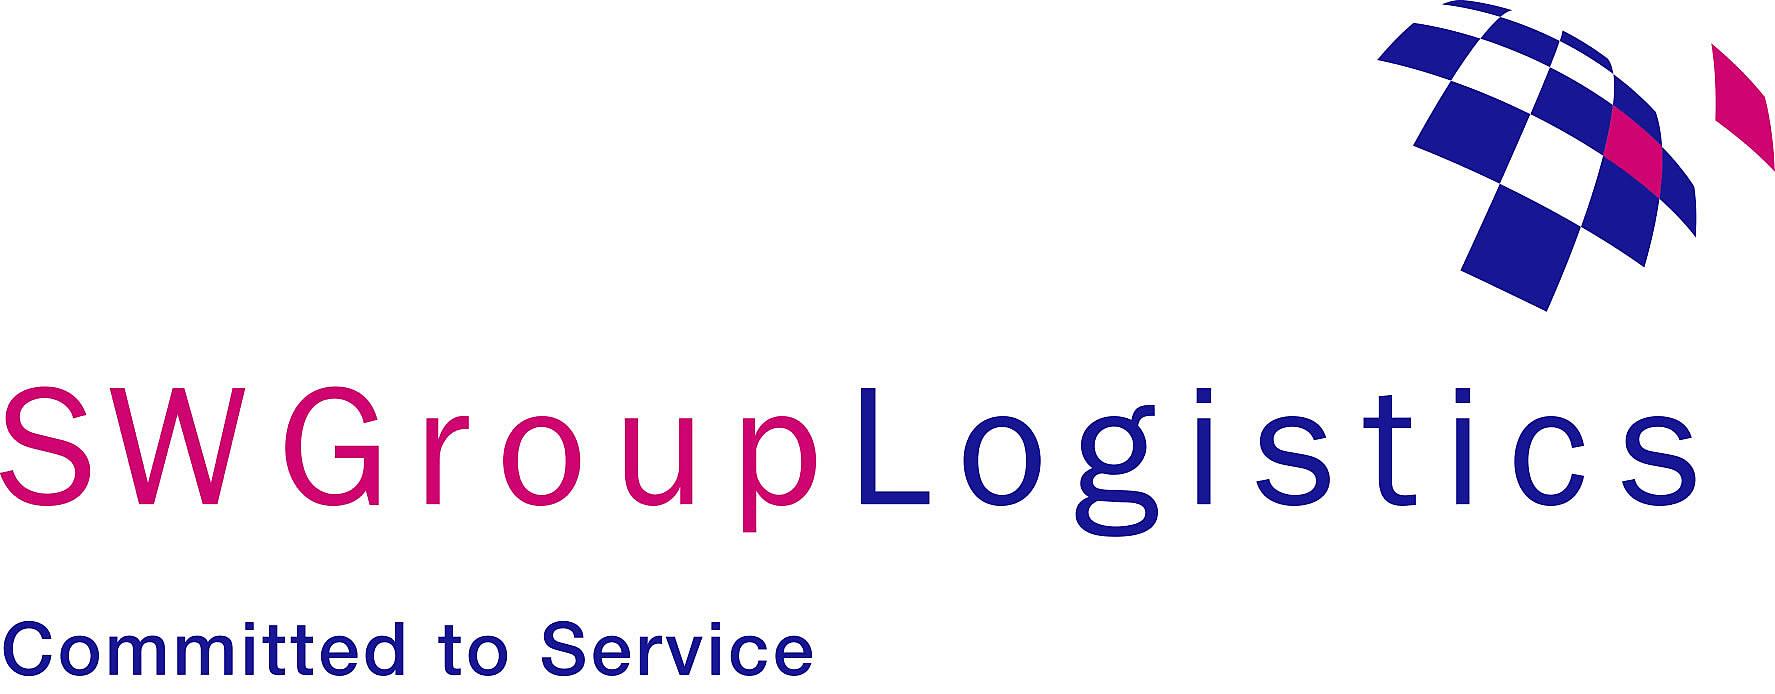 SW Logistics logo